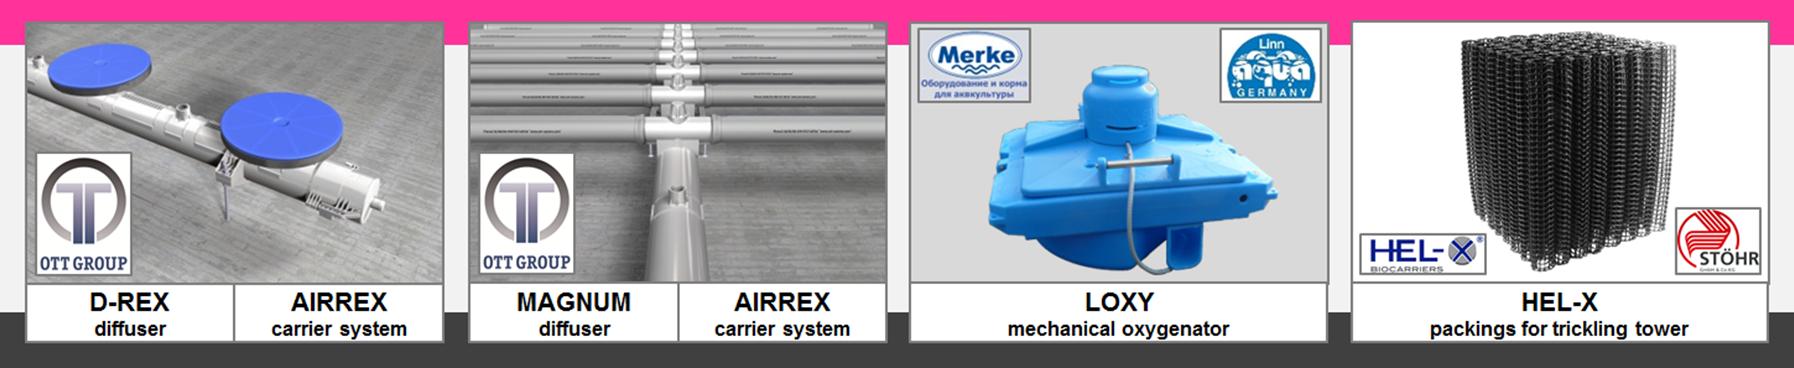 REX-M aeration RAS oxygenation degassing aquaculture